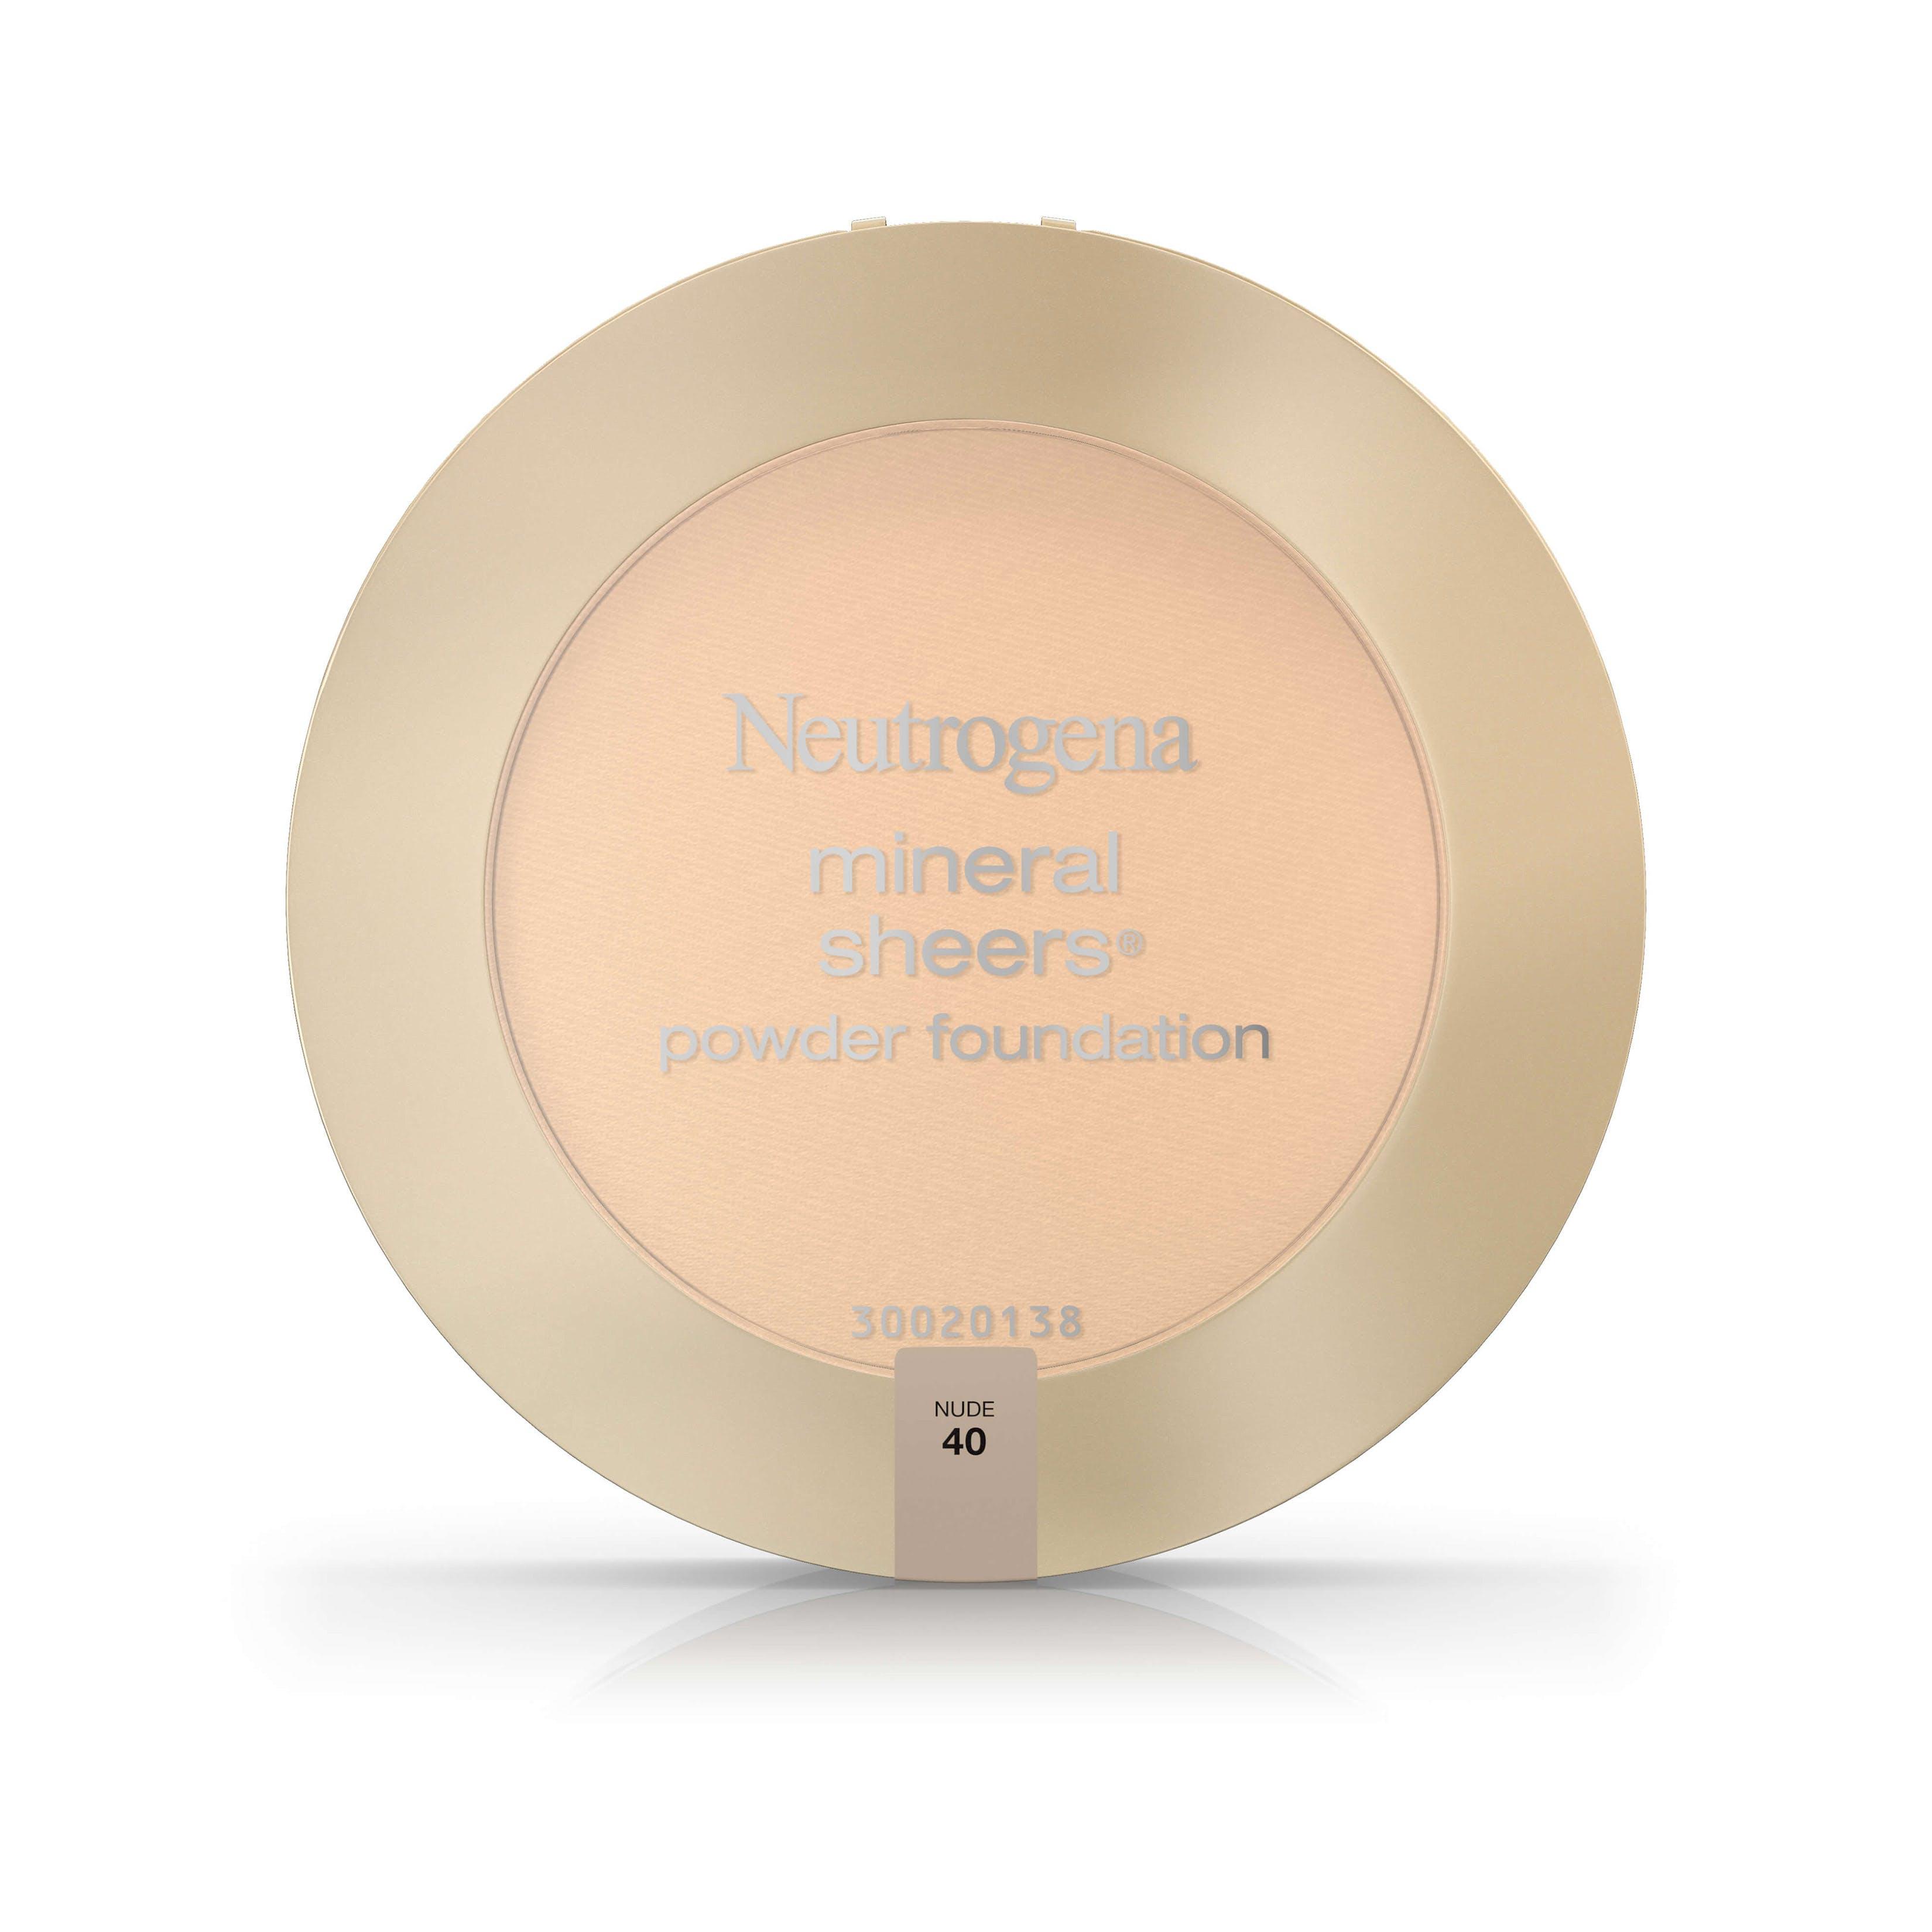 Neutrogena Mineral Sheers Powder Foundation Neutrogena